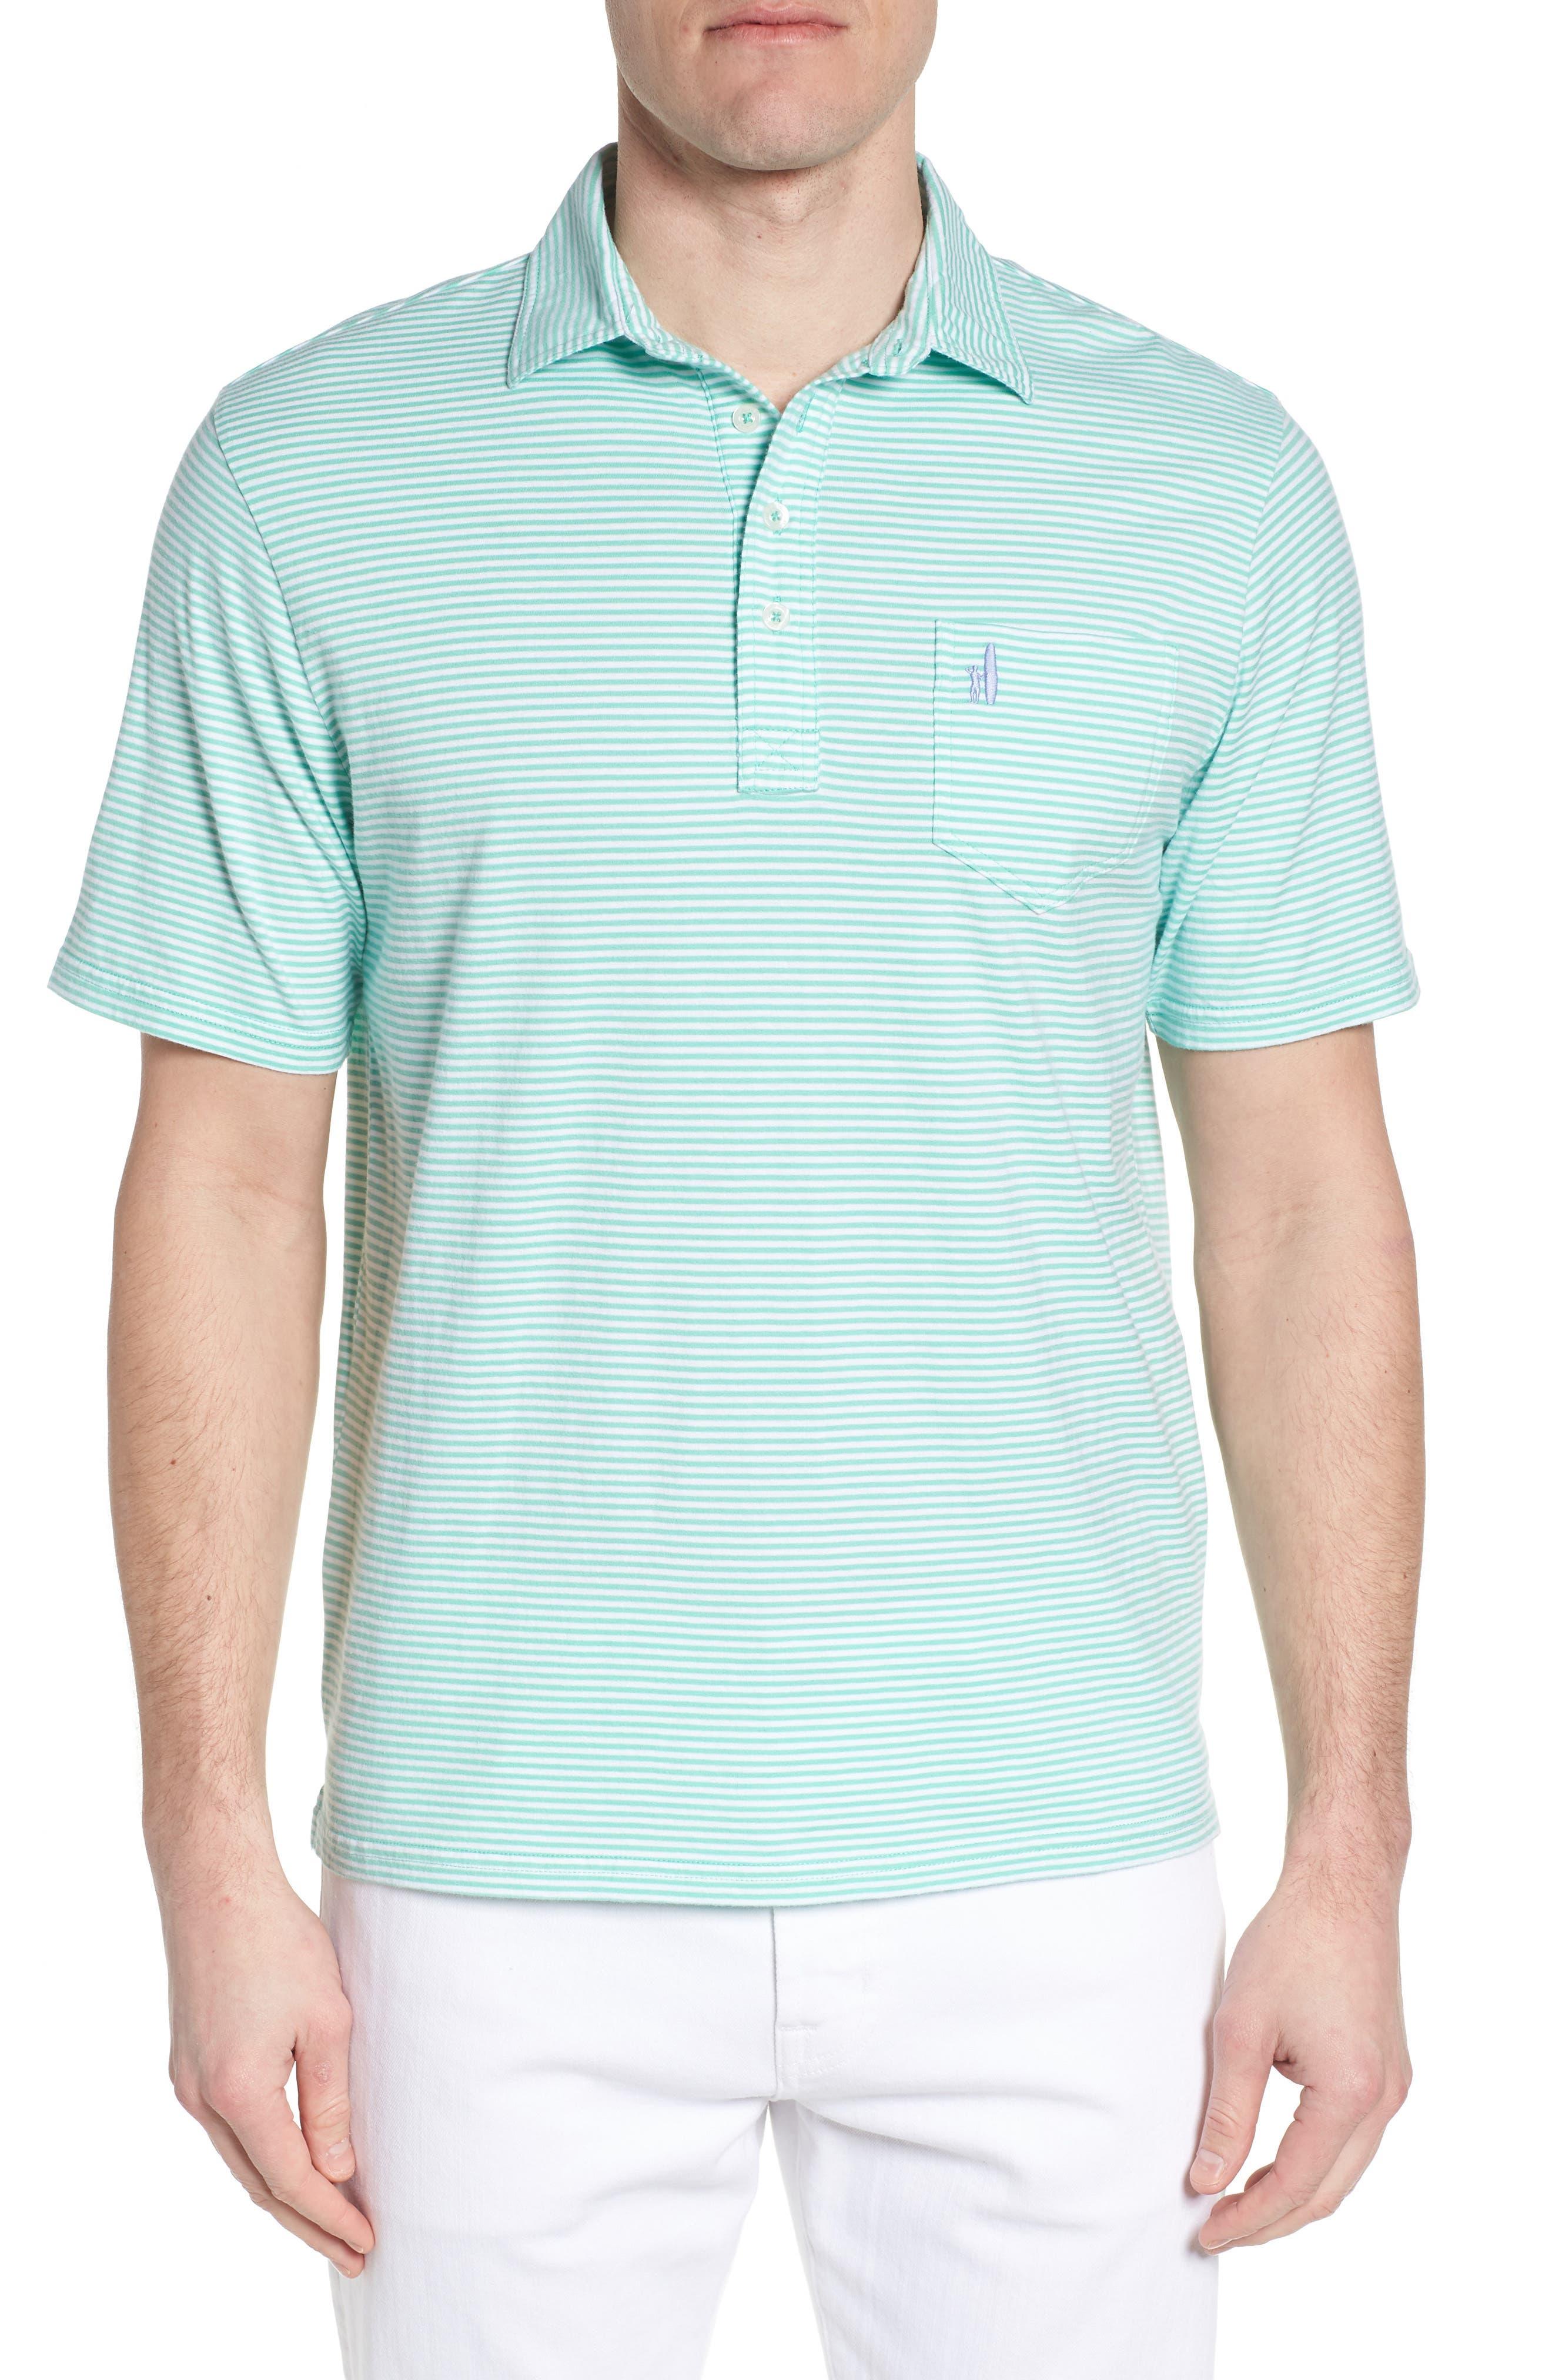 JOHNNIE-O Jack Stripe Jersey Polo, Main, color, 339